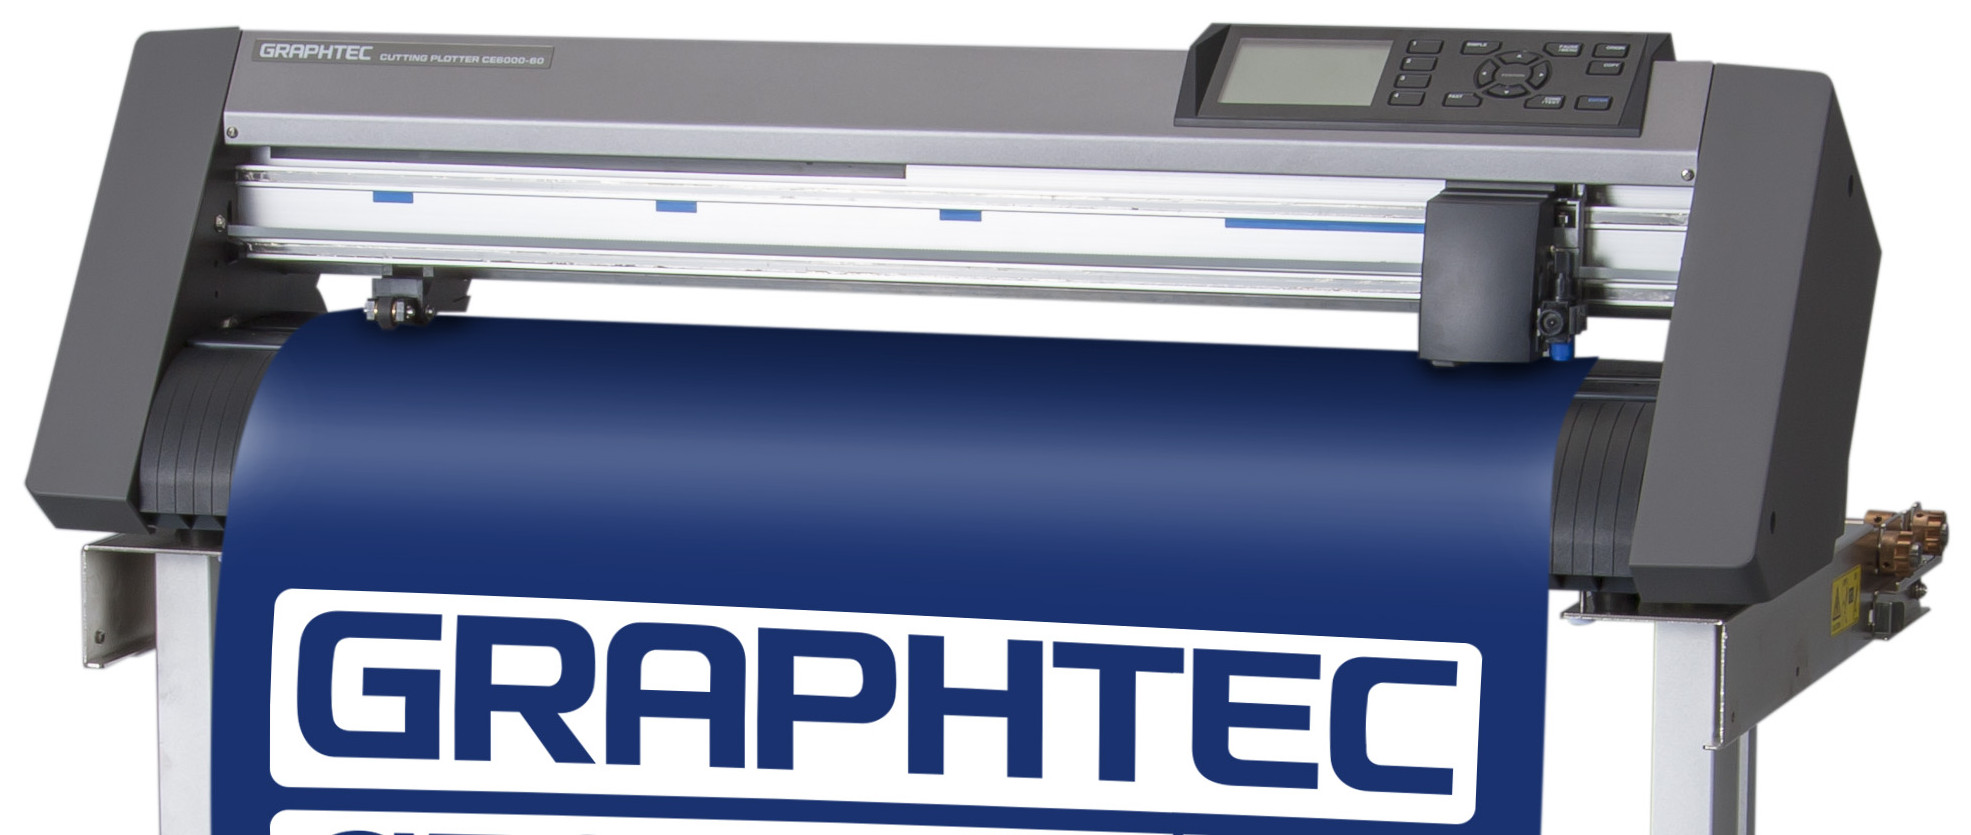 Rolkowy ploter tnący GRAPHTEC CE6000-60